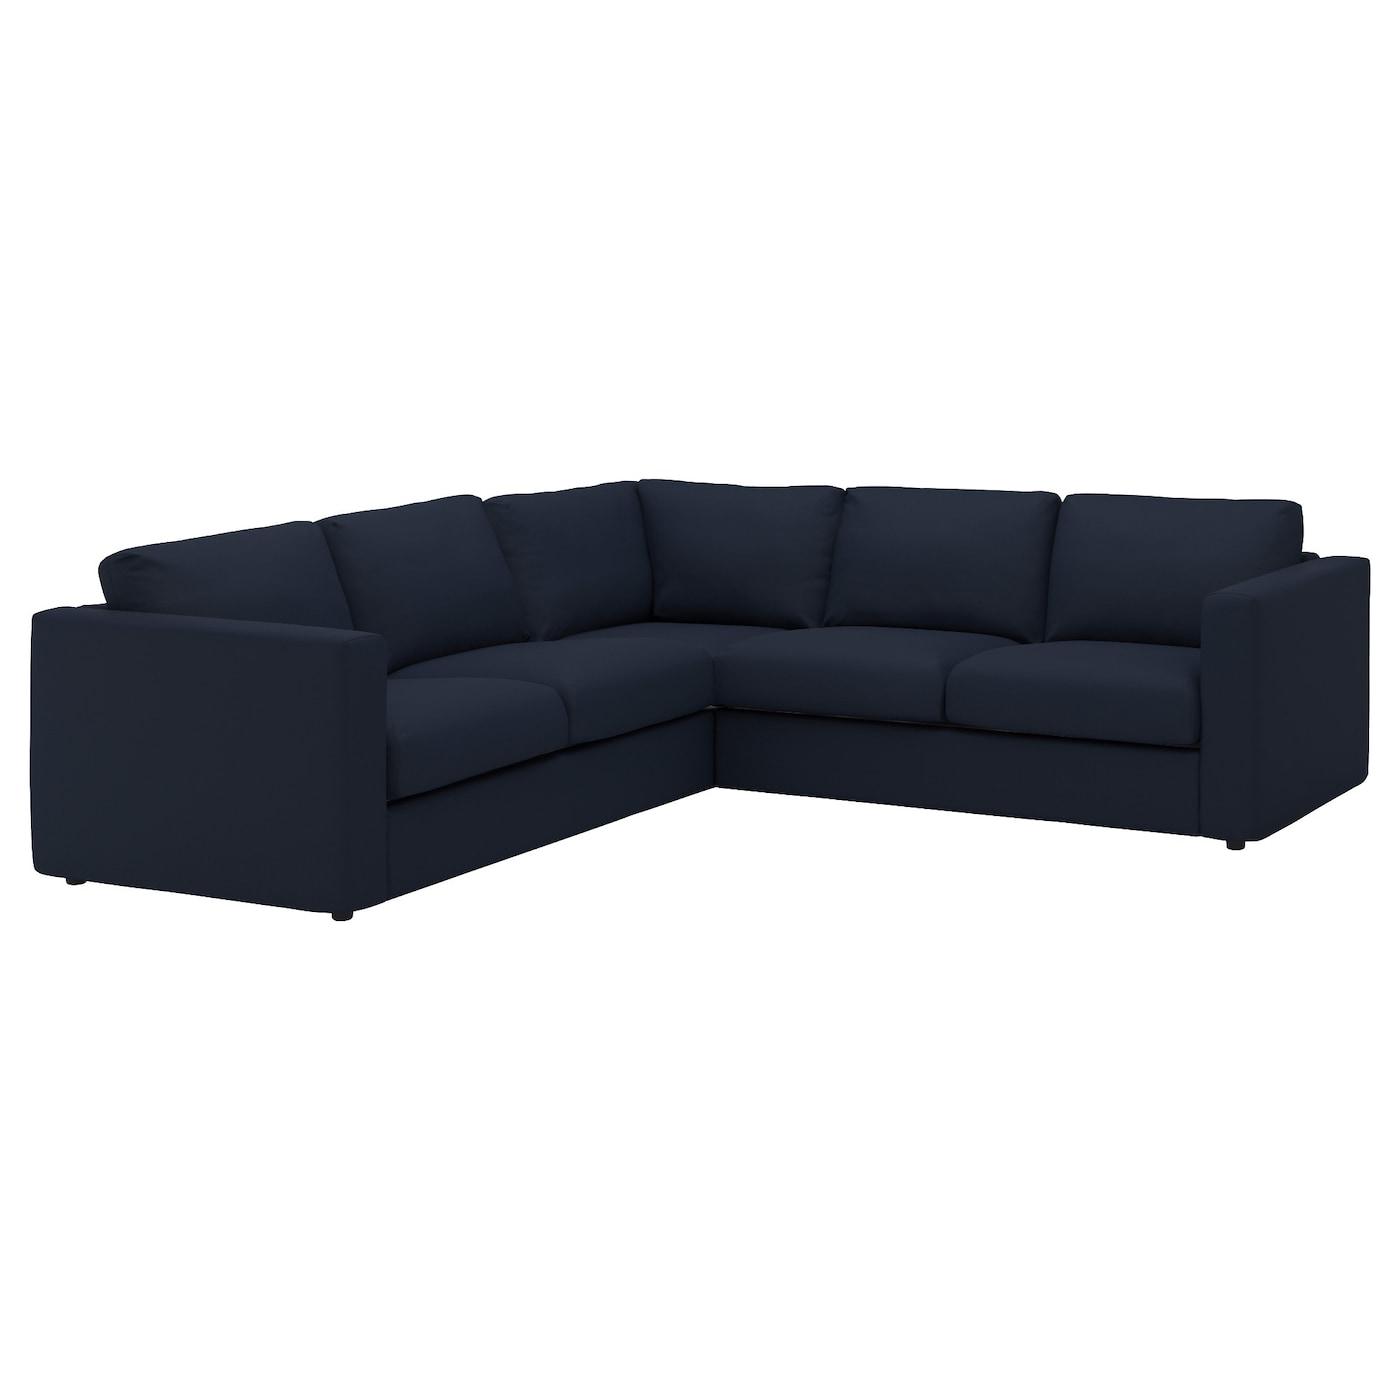 Images Of Corner Sofas: VIMLE Corner Sofa, 4-seat Gräsbo Black-blue